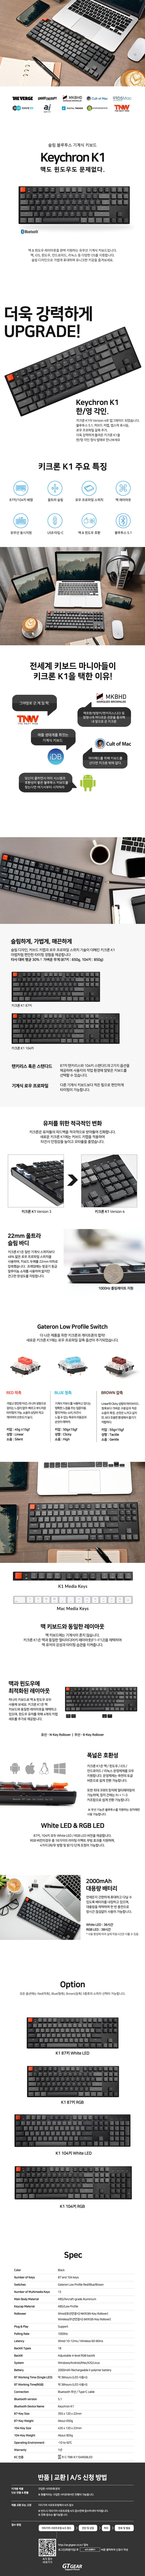 Keychron K1 Version4 텐키리스 RGB (청축)